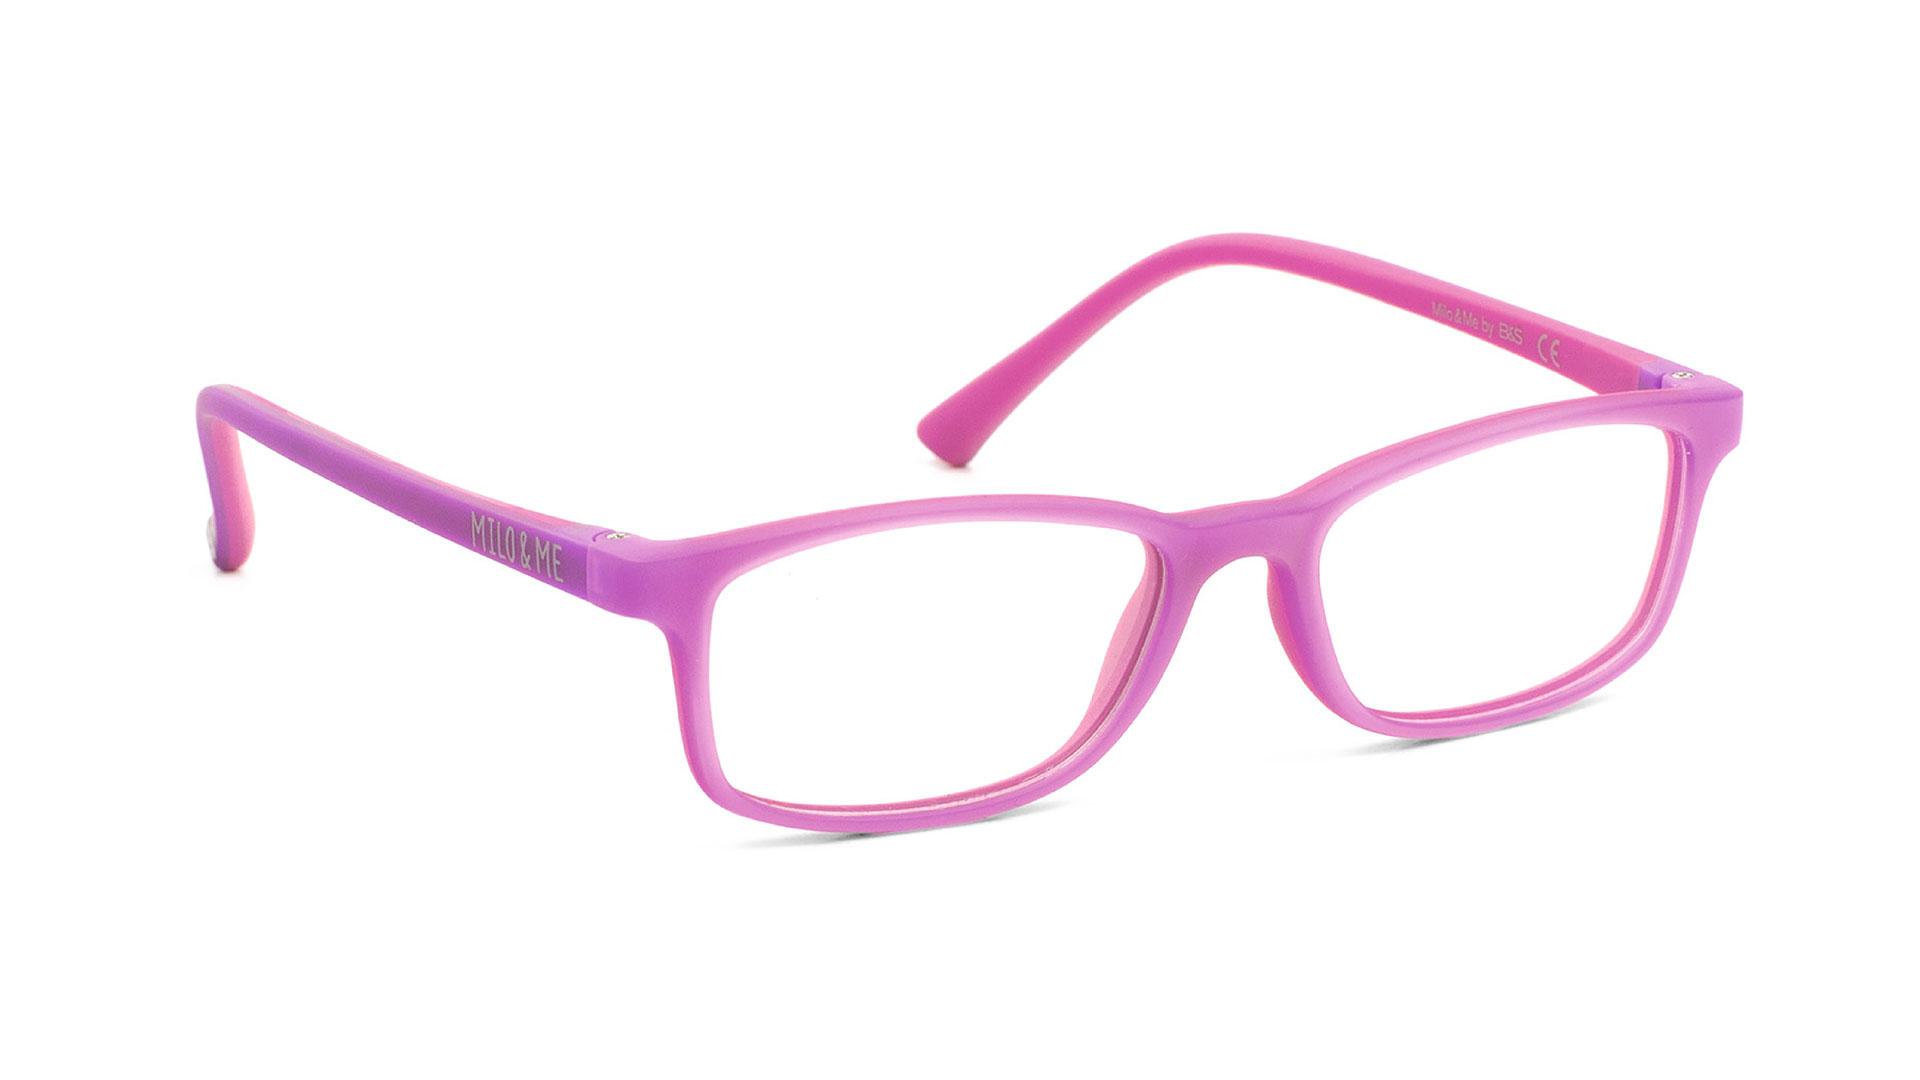 Fuchsia Pink H85030-08 - Milo & Me Eyewear - Optimum RX Lens Specialists